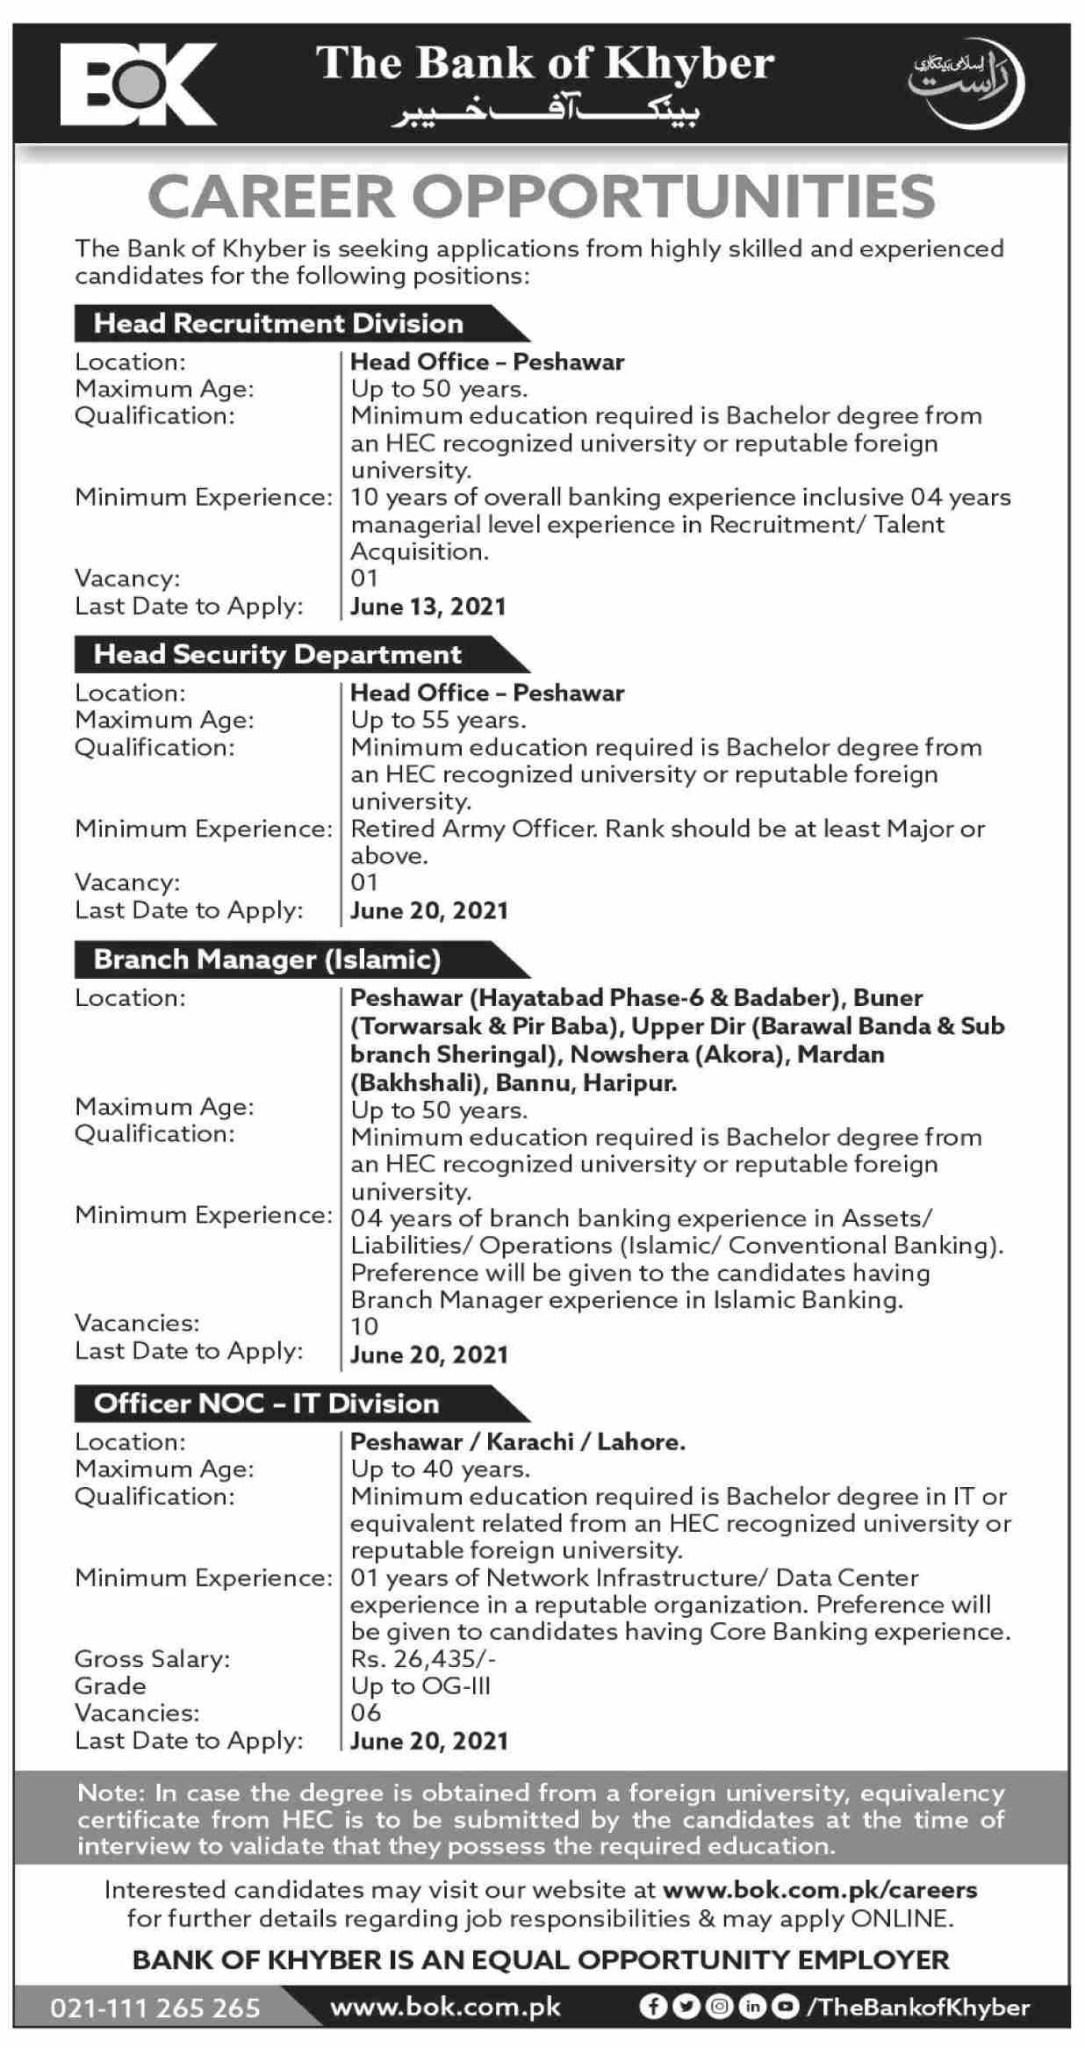 The Bank of Khyber Jobs 2021 | BOK jobs 2021